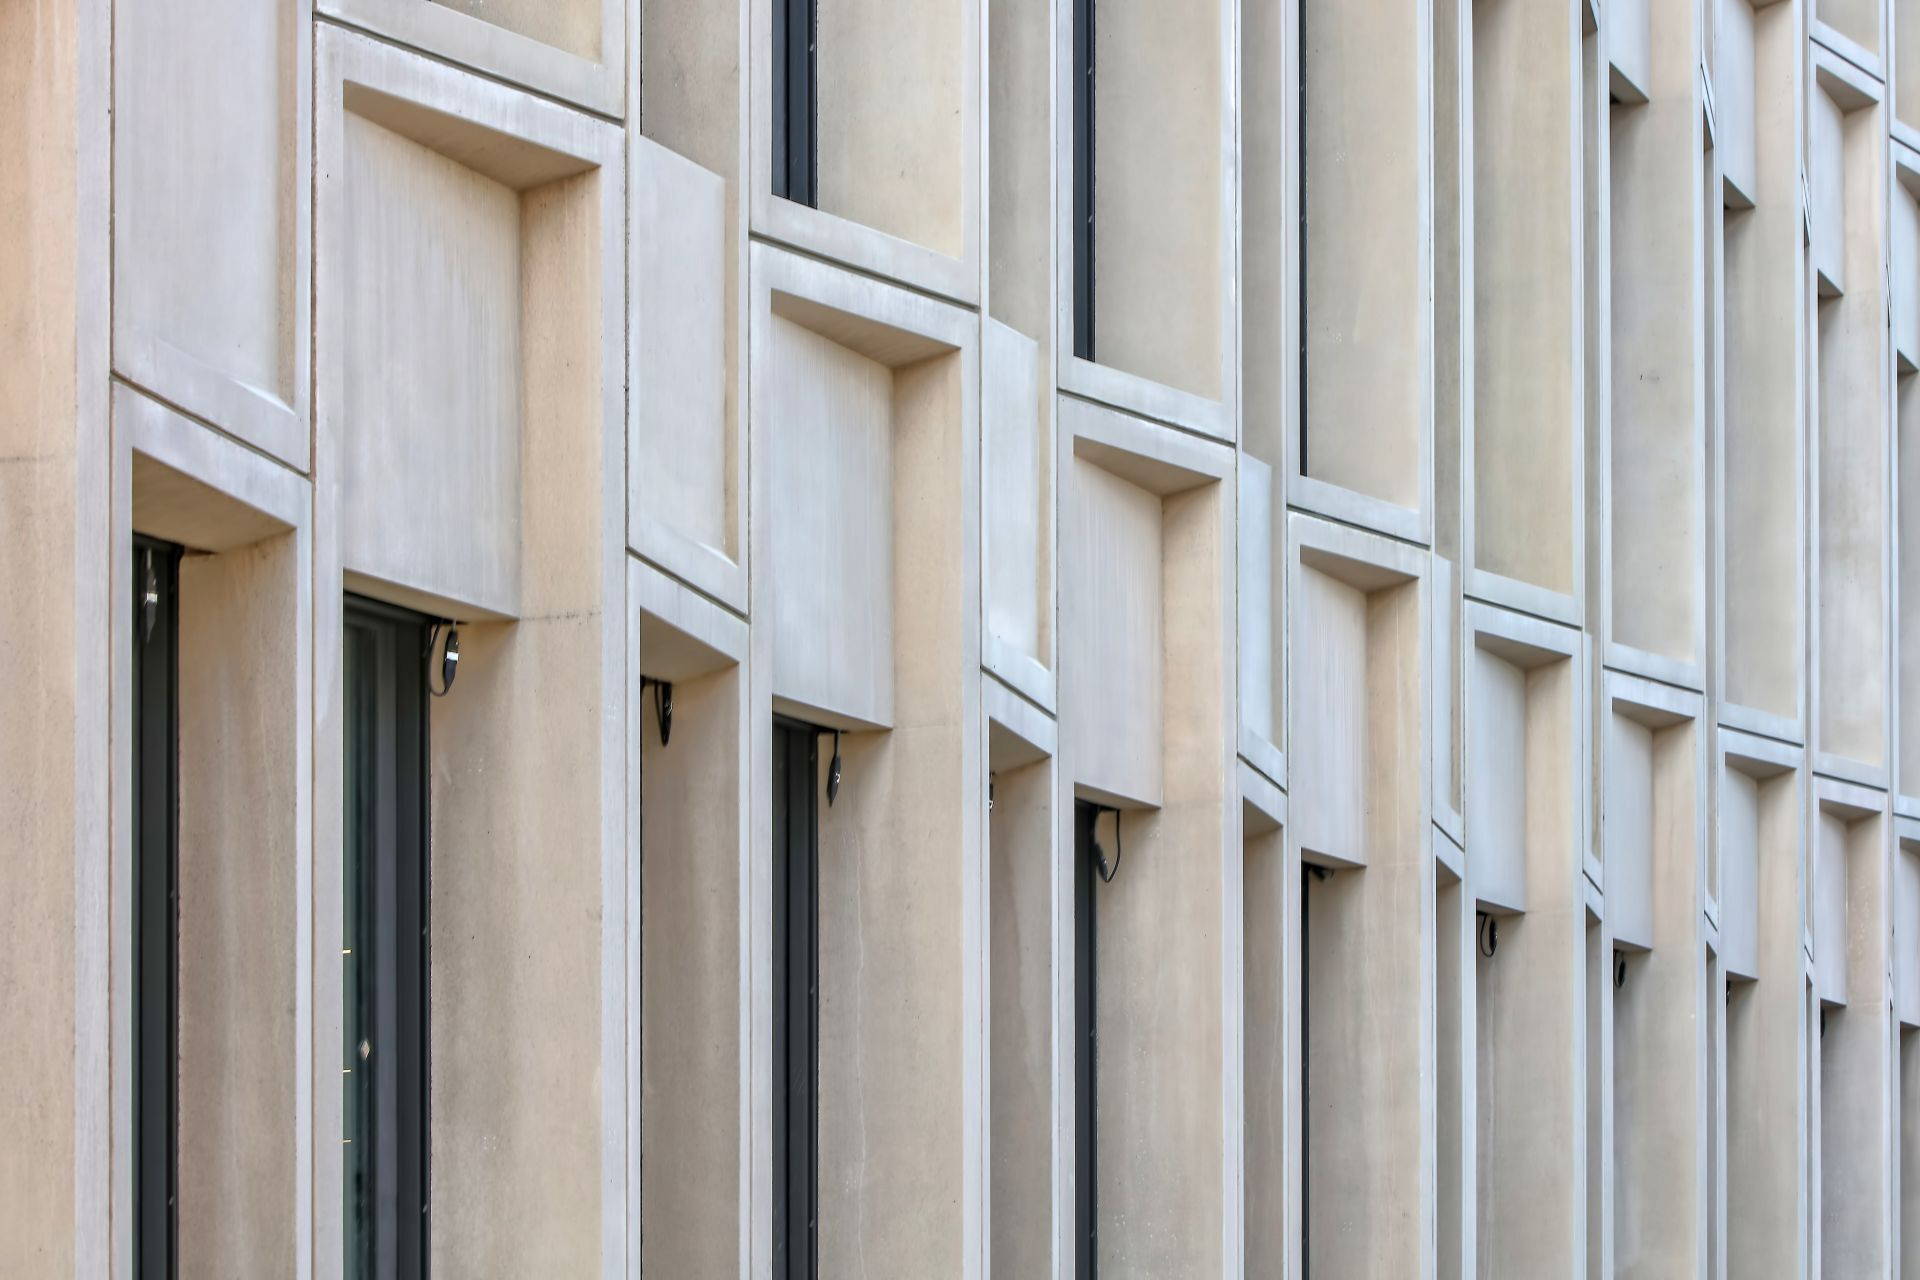 Precast colored concrete with a fine-blasted surface